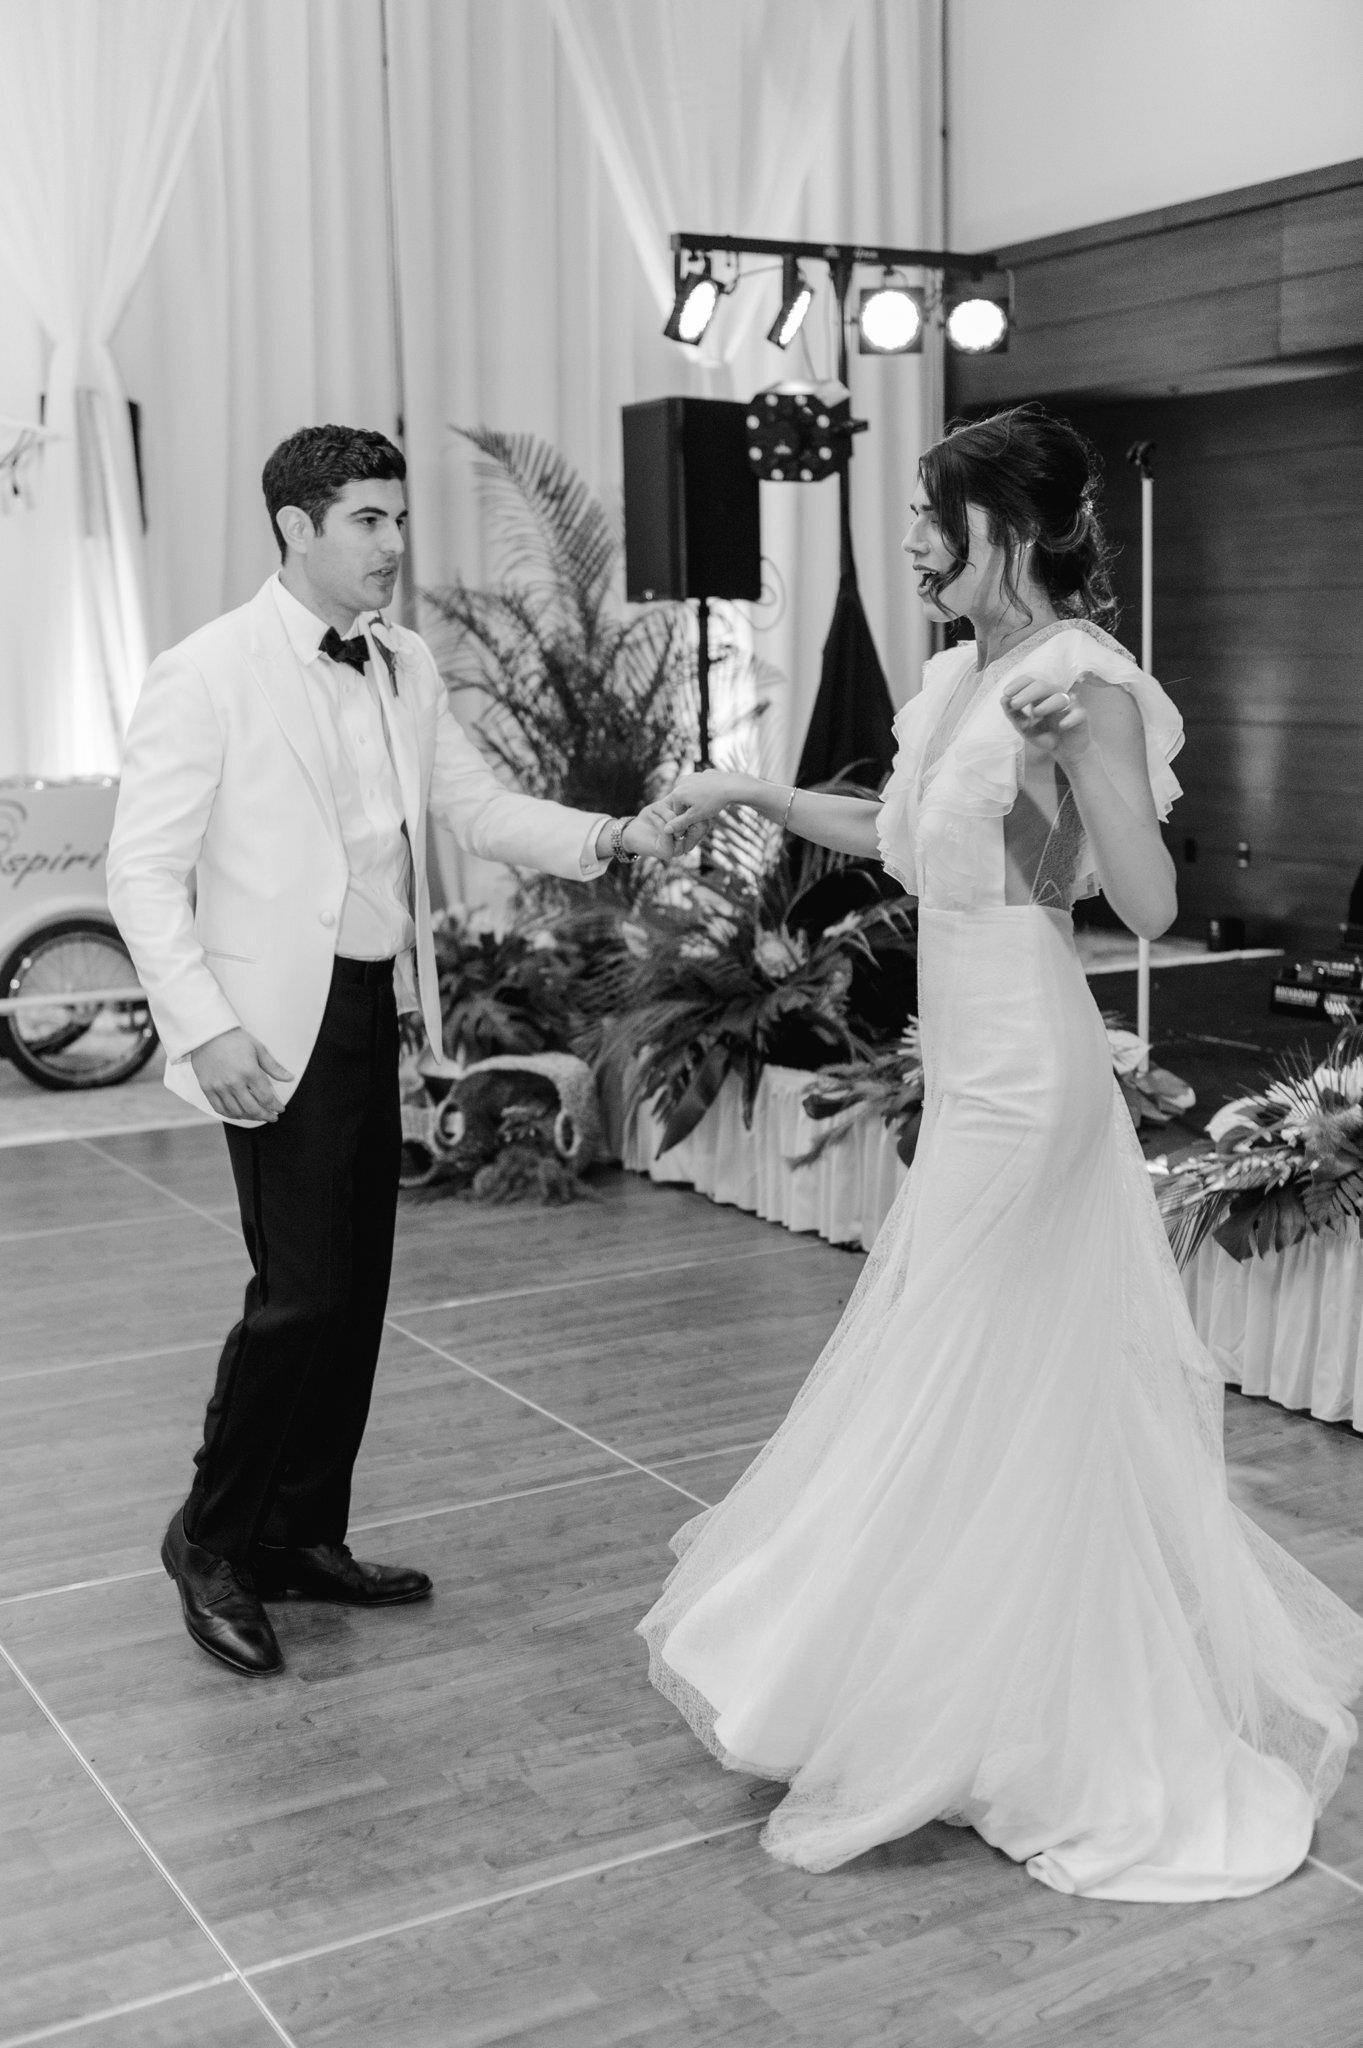 jw marriott marco island wedding photographer marco island wedding photographer shannon griffin photography_0188.jpg